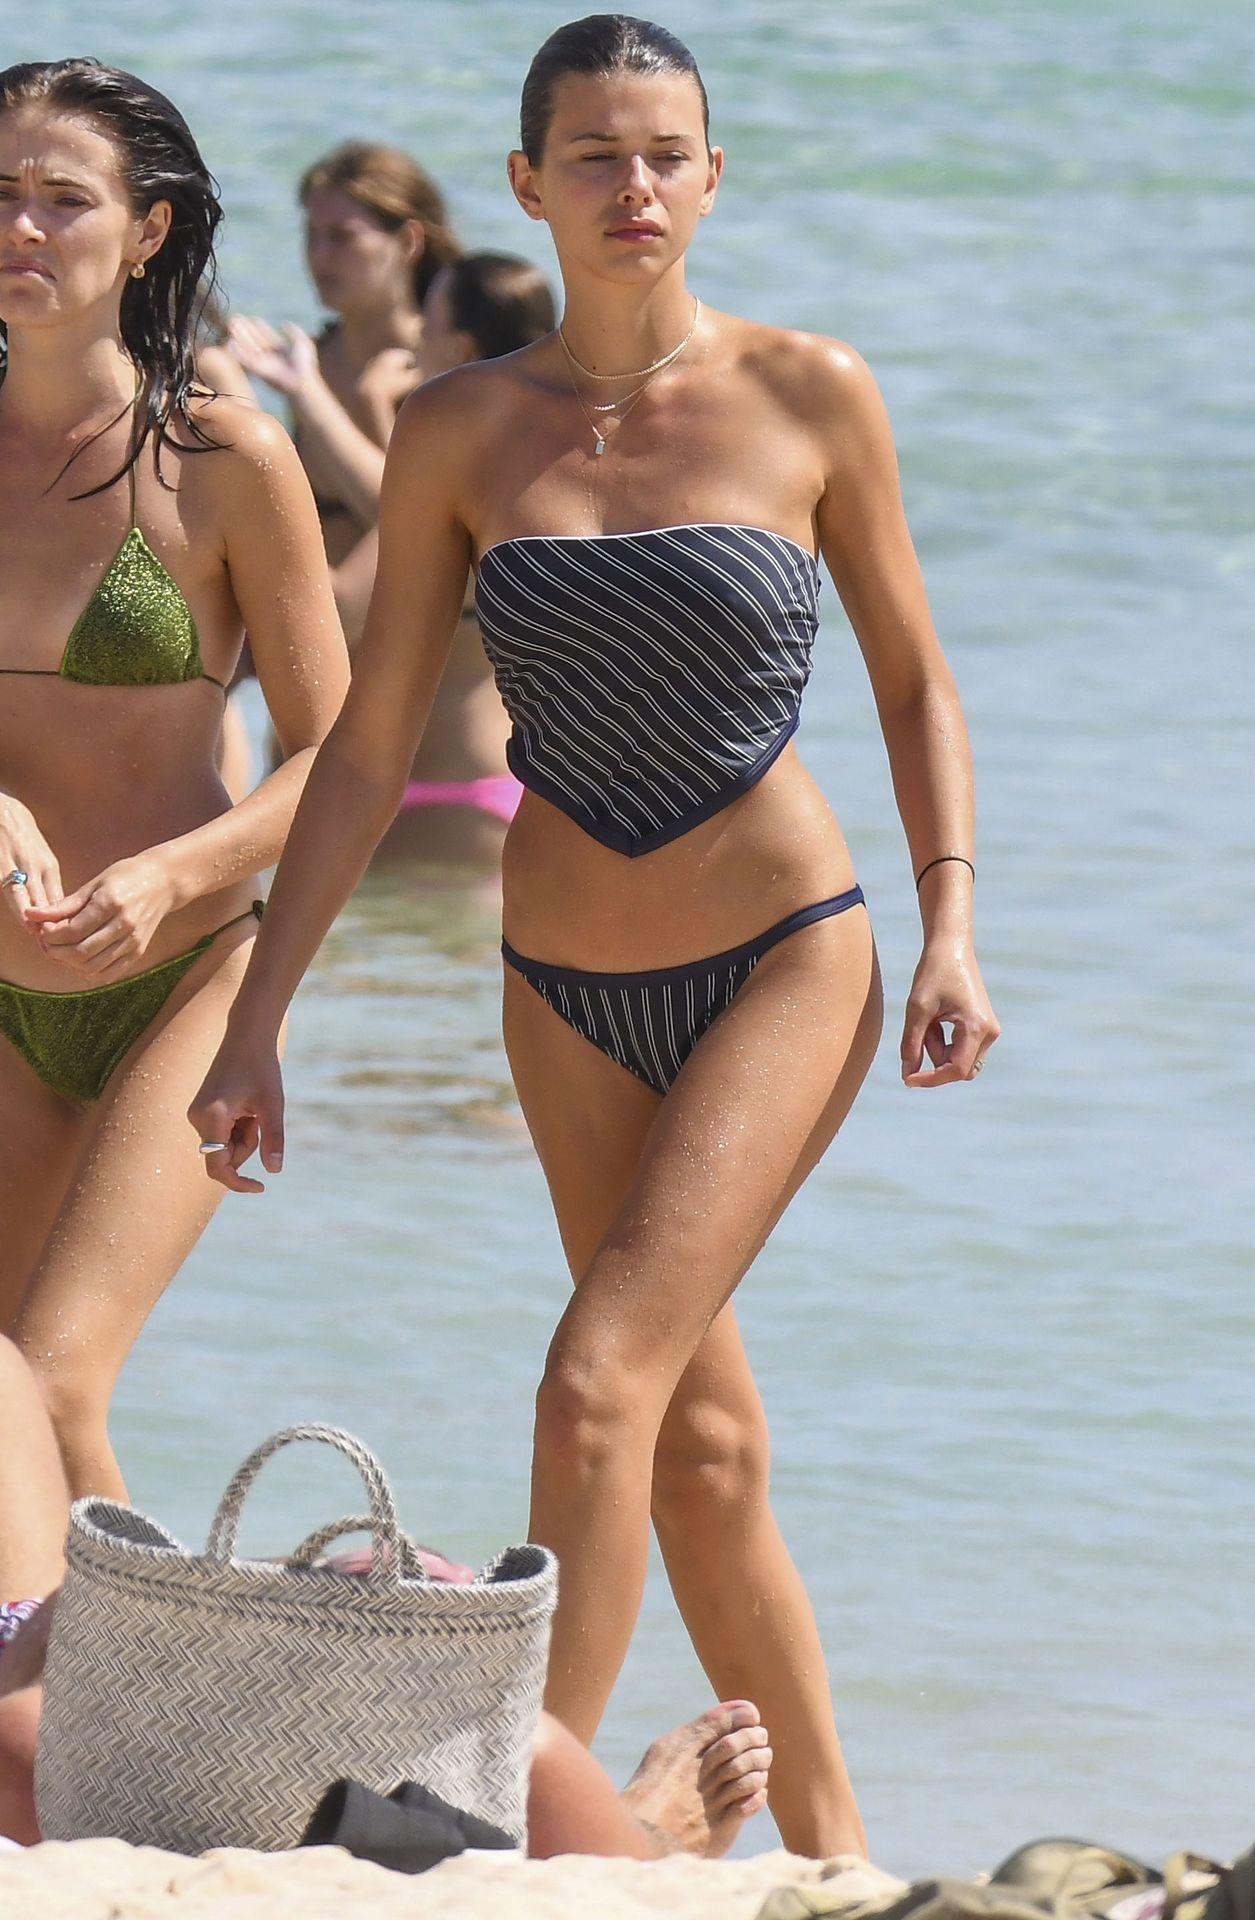 Kiwi model georgia fowler criticized for sharing bikini photos in the wake of new zealand